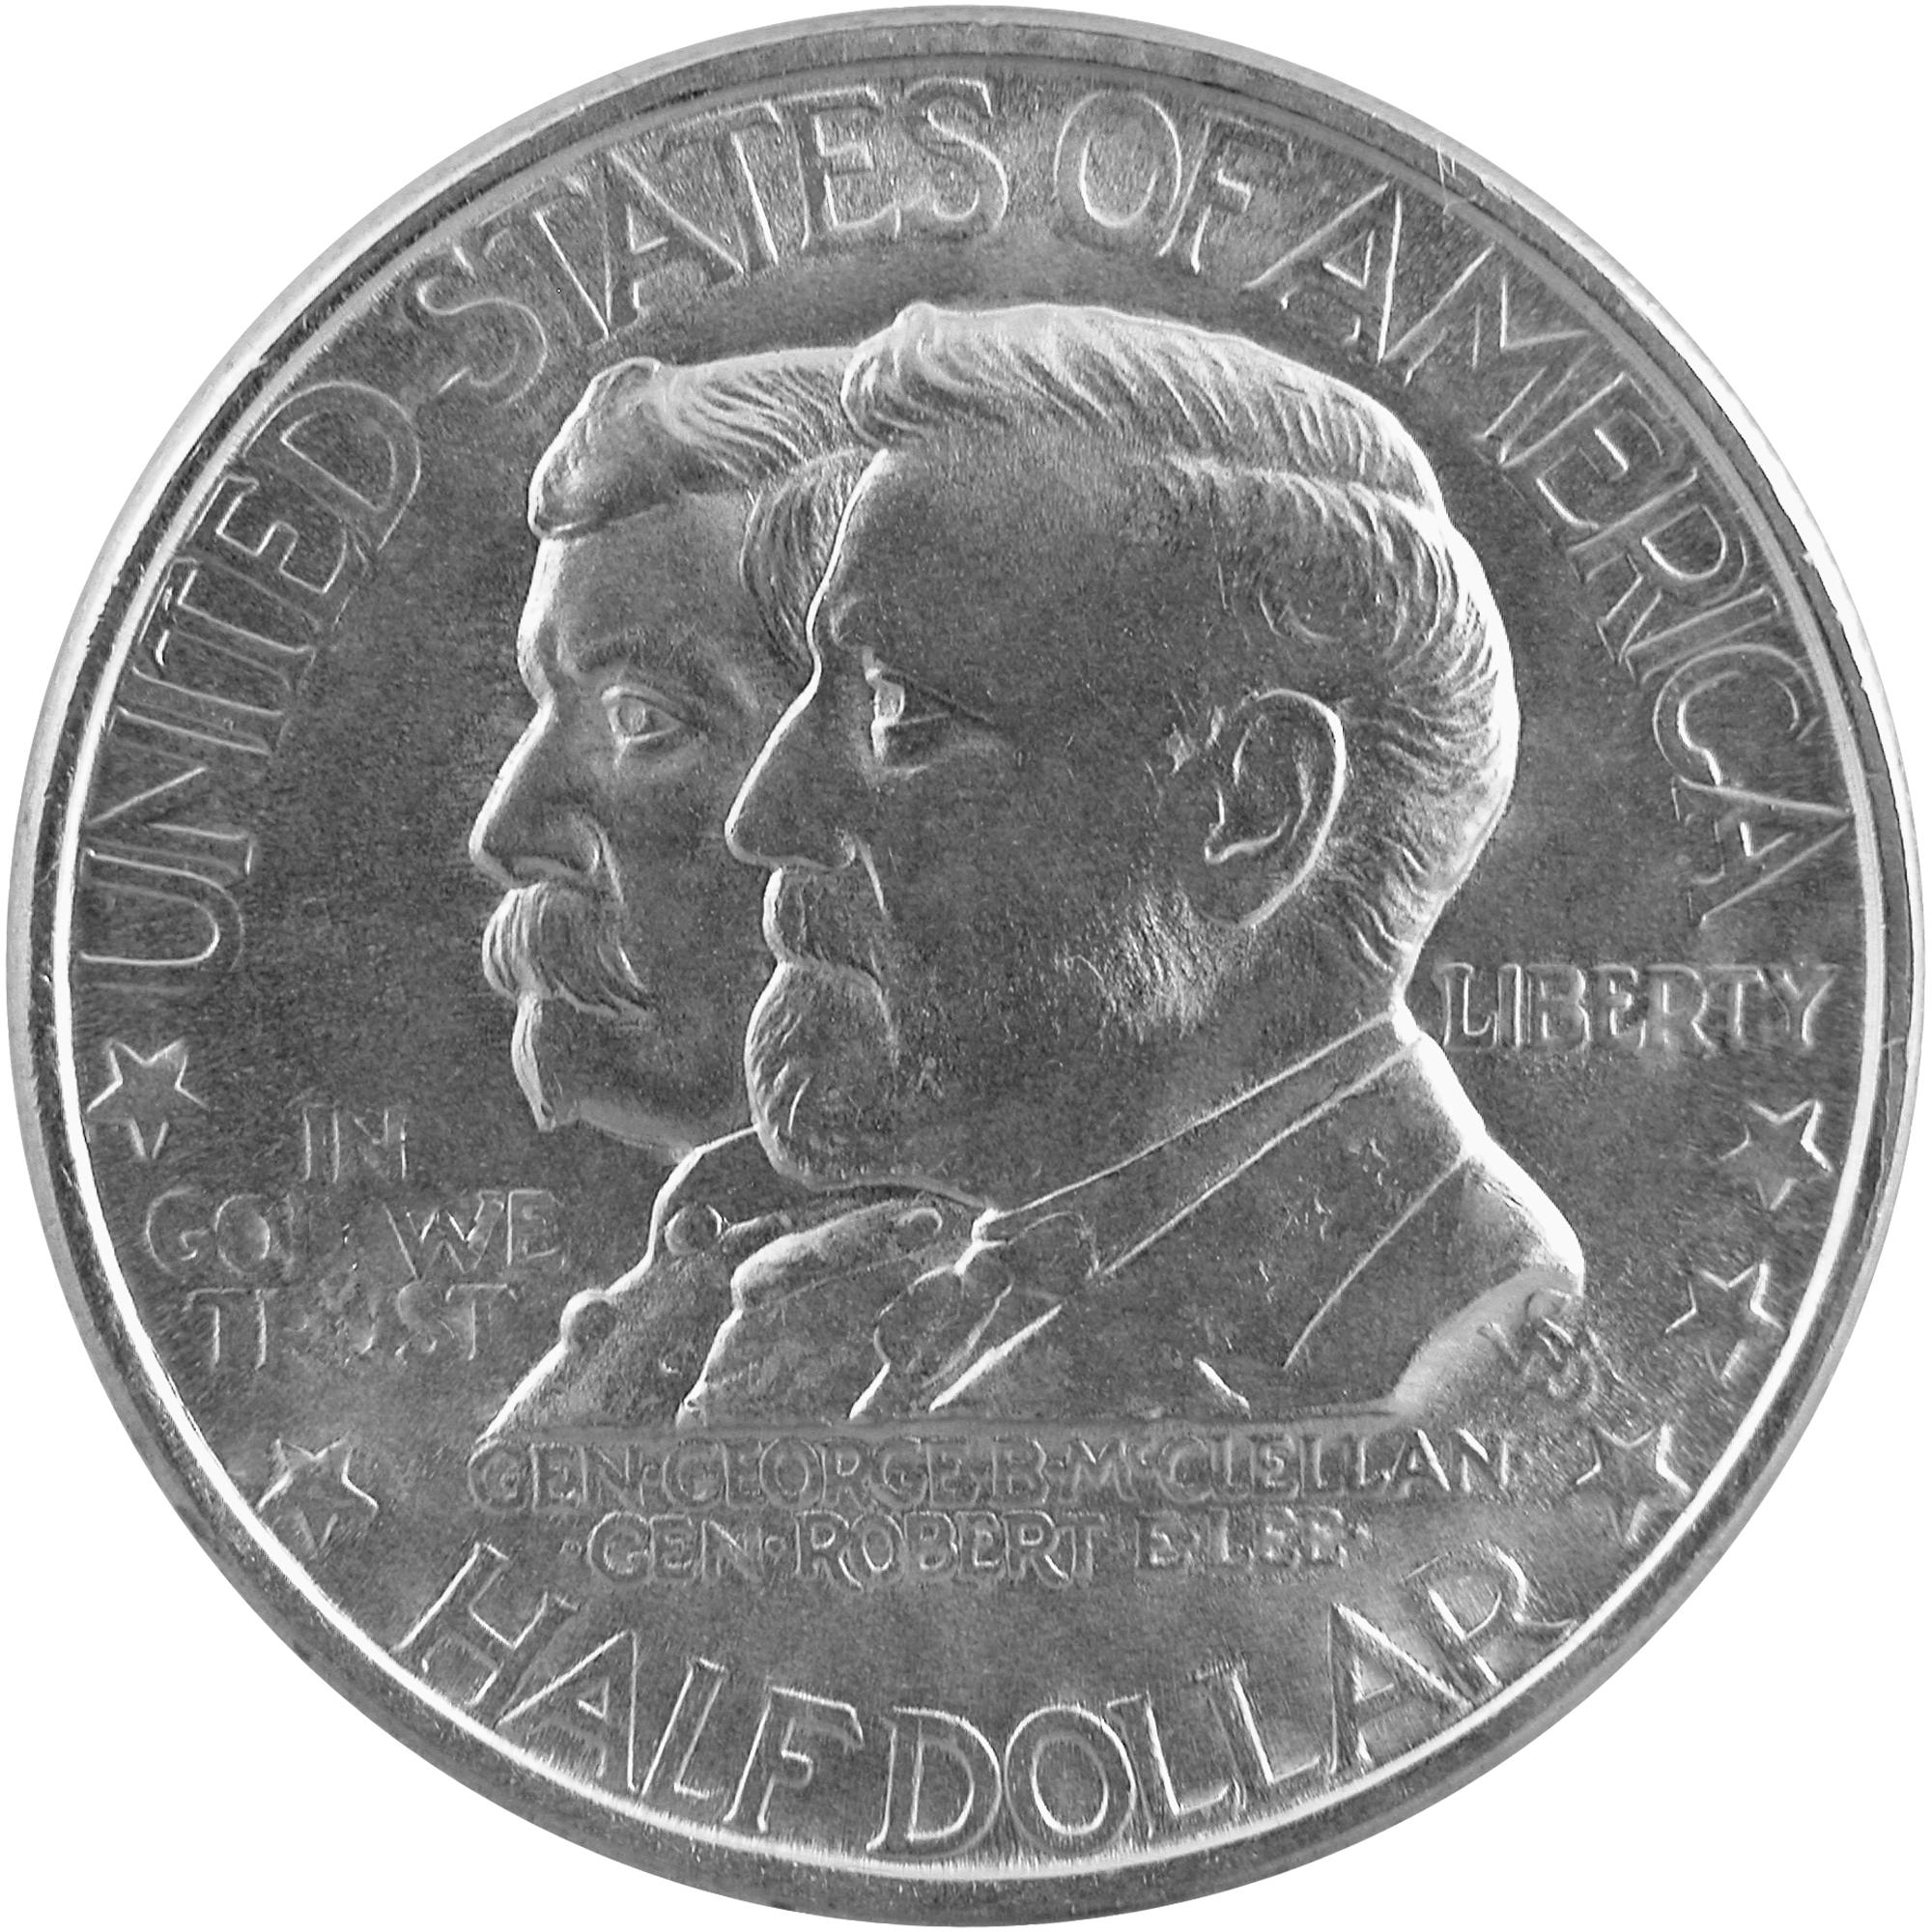 1937 Battle Of Antietam Seventy Fifth Anniversary Commemorative Silver Half Dollar Coin Obverse